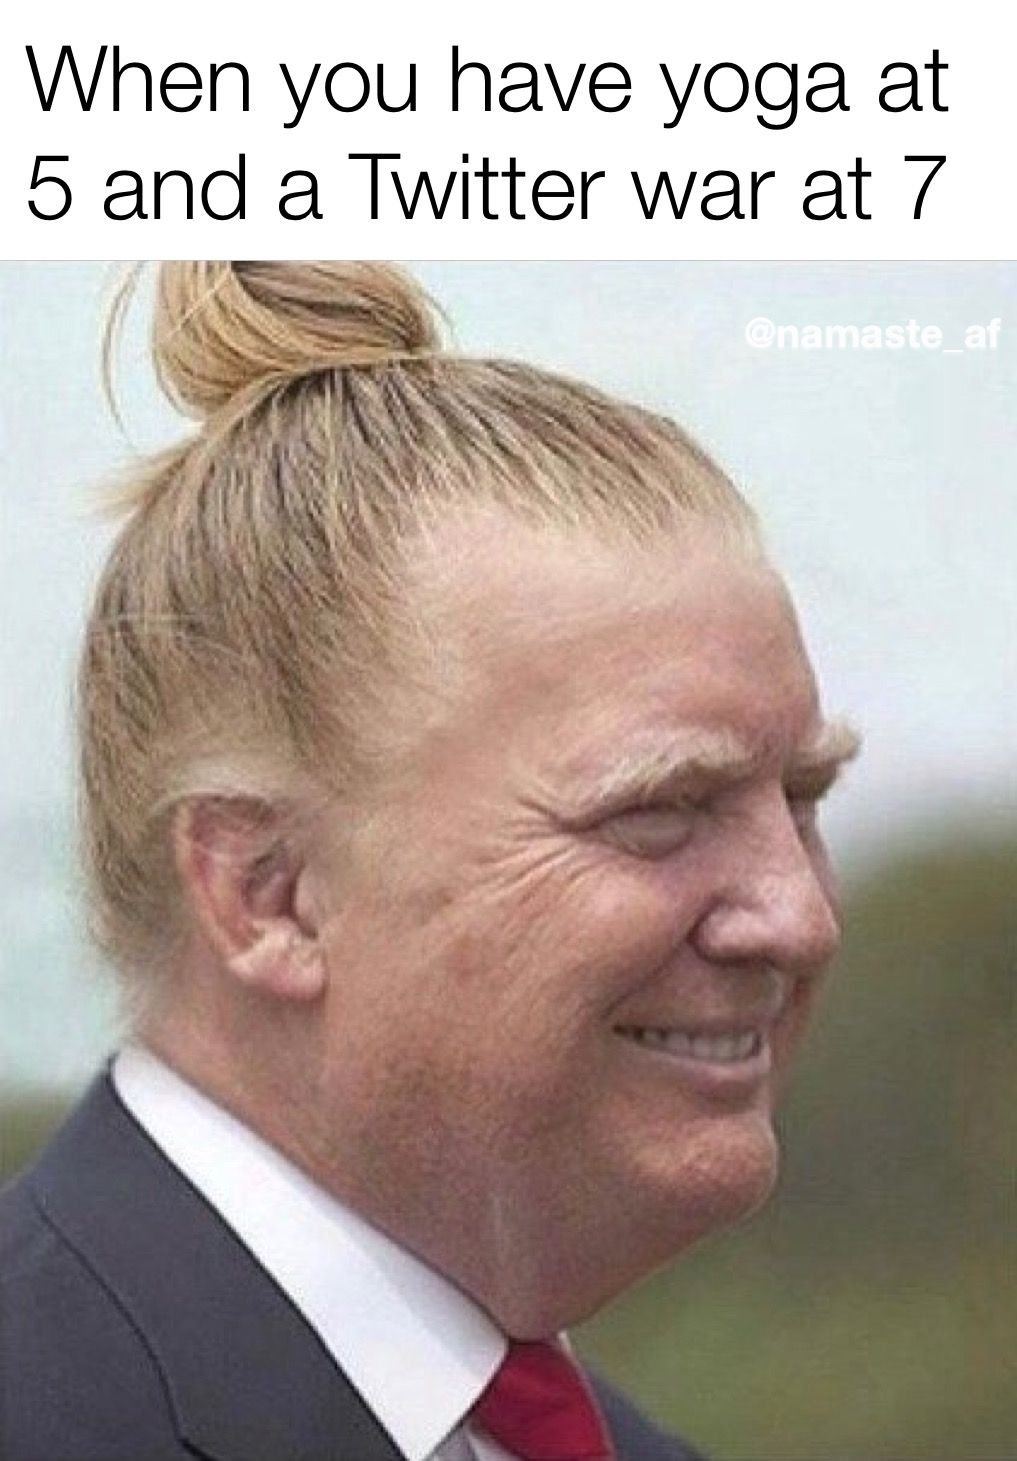 Trump Man Bun Man Bun Meme Memes Trump Man Bun